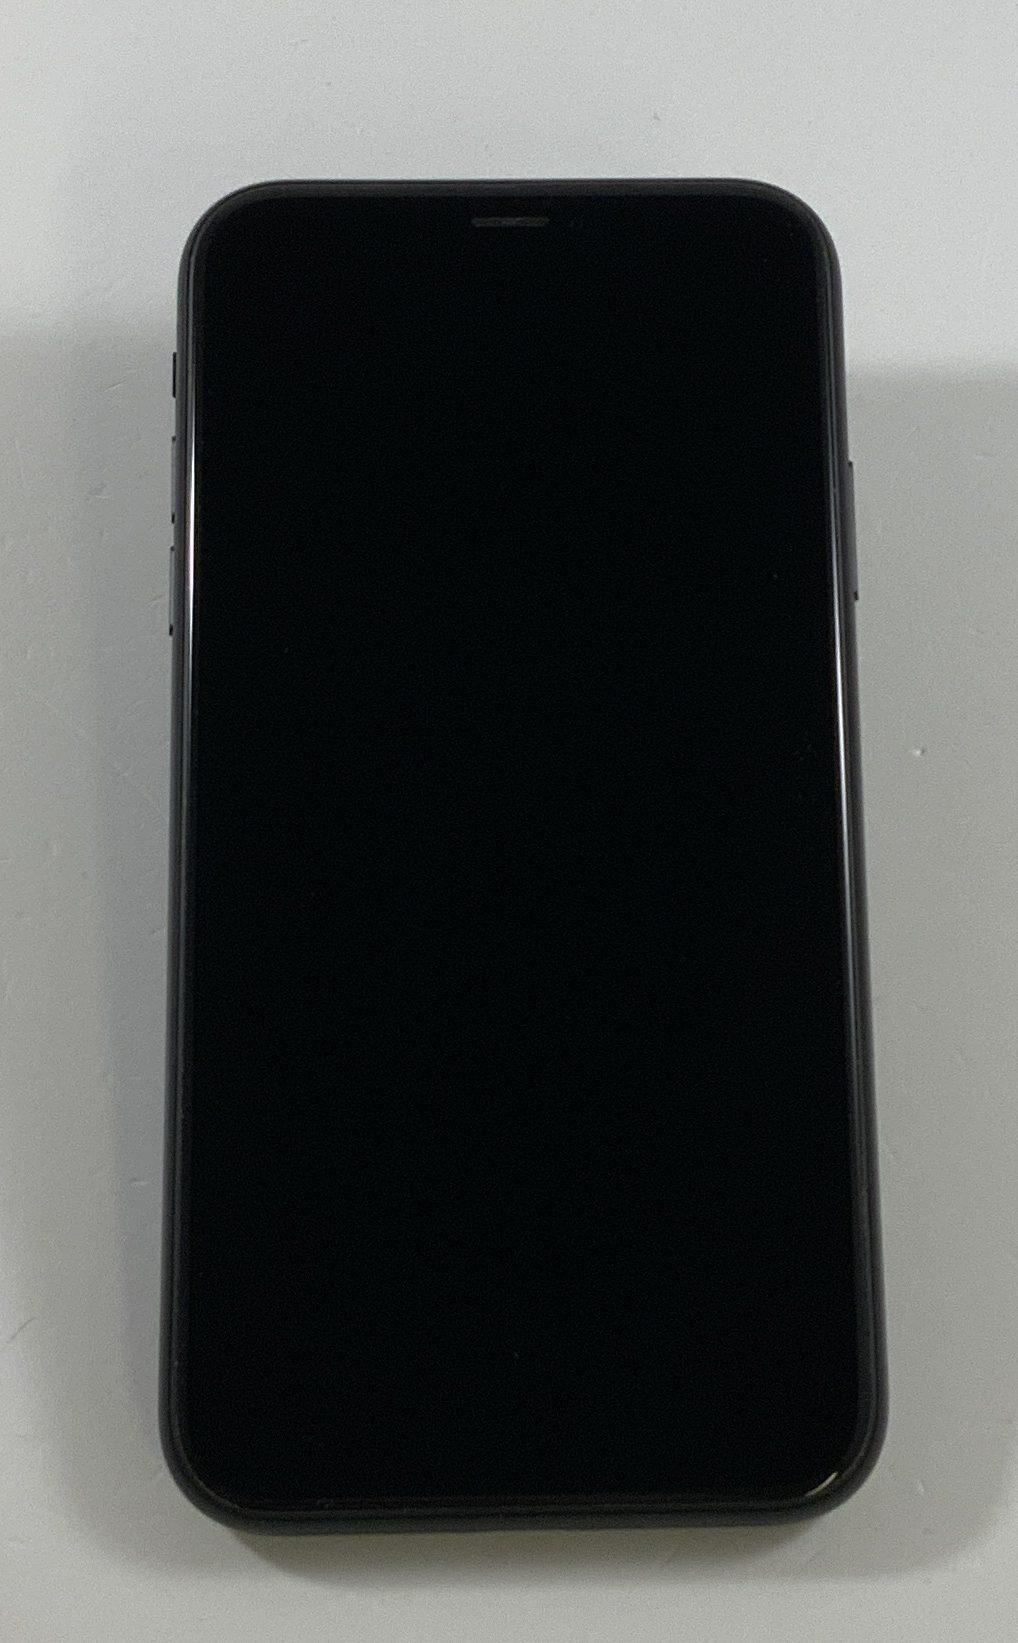 iPhone XR 128GB, 128GB, Black, Afbeelding 1